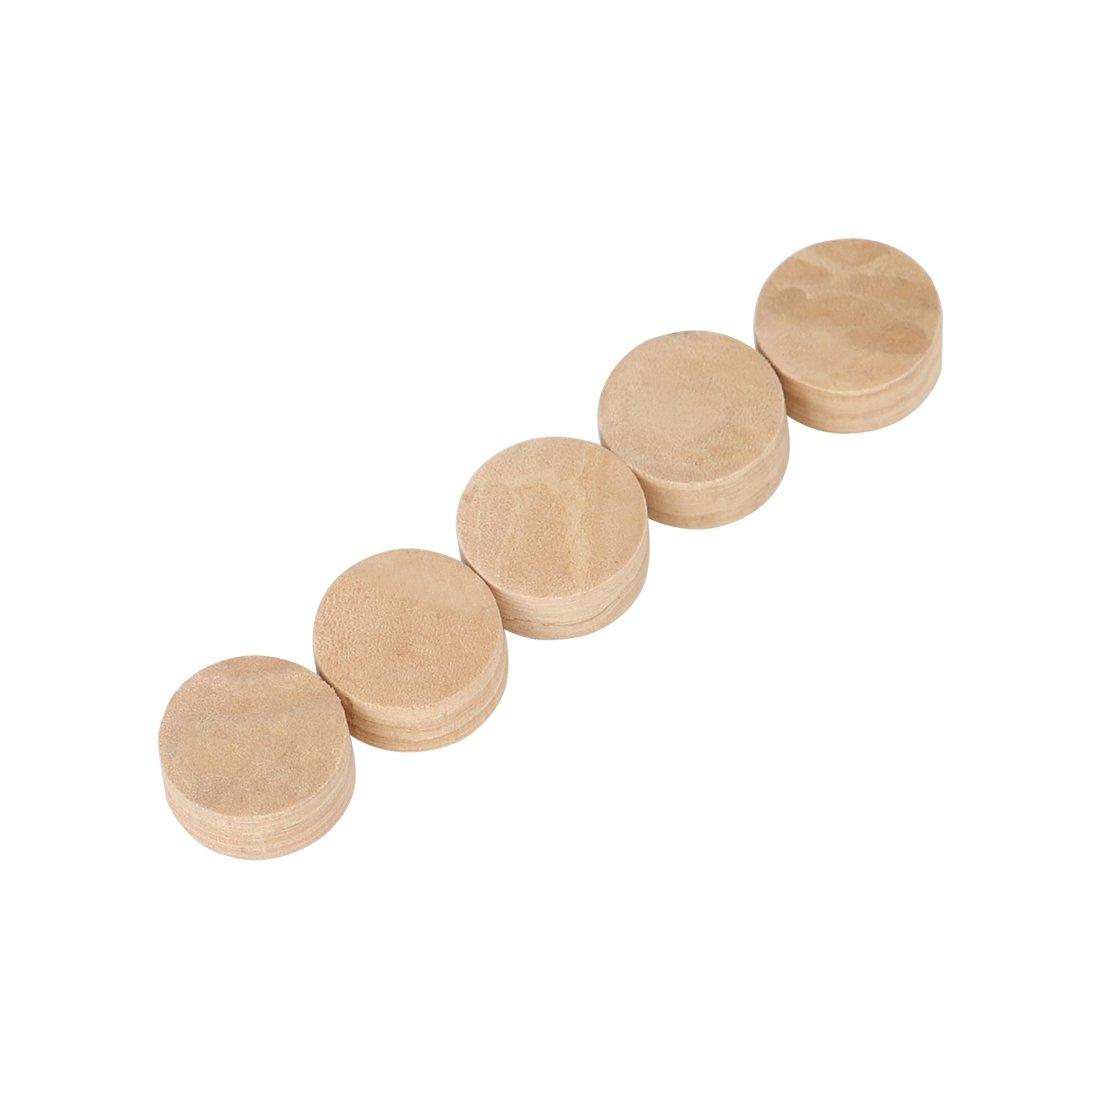 5PCS ND152 Trombone Water Key Cork Plug Trombone Cork Accessories